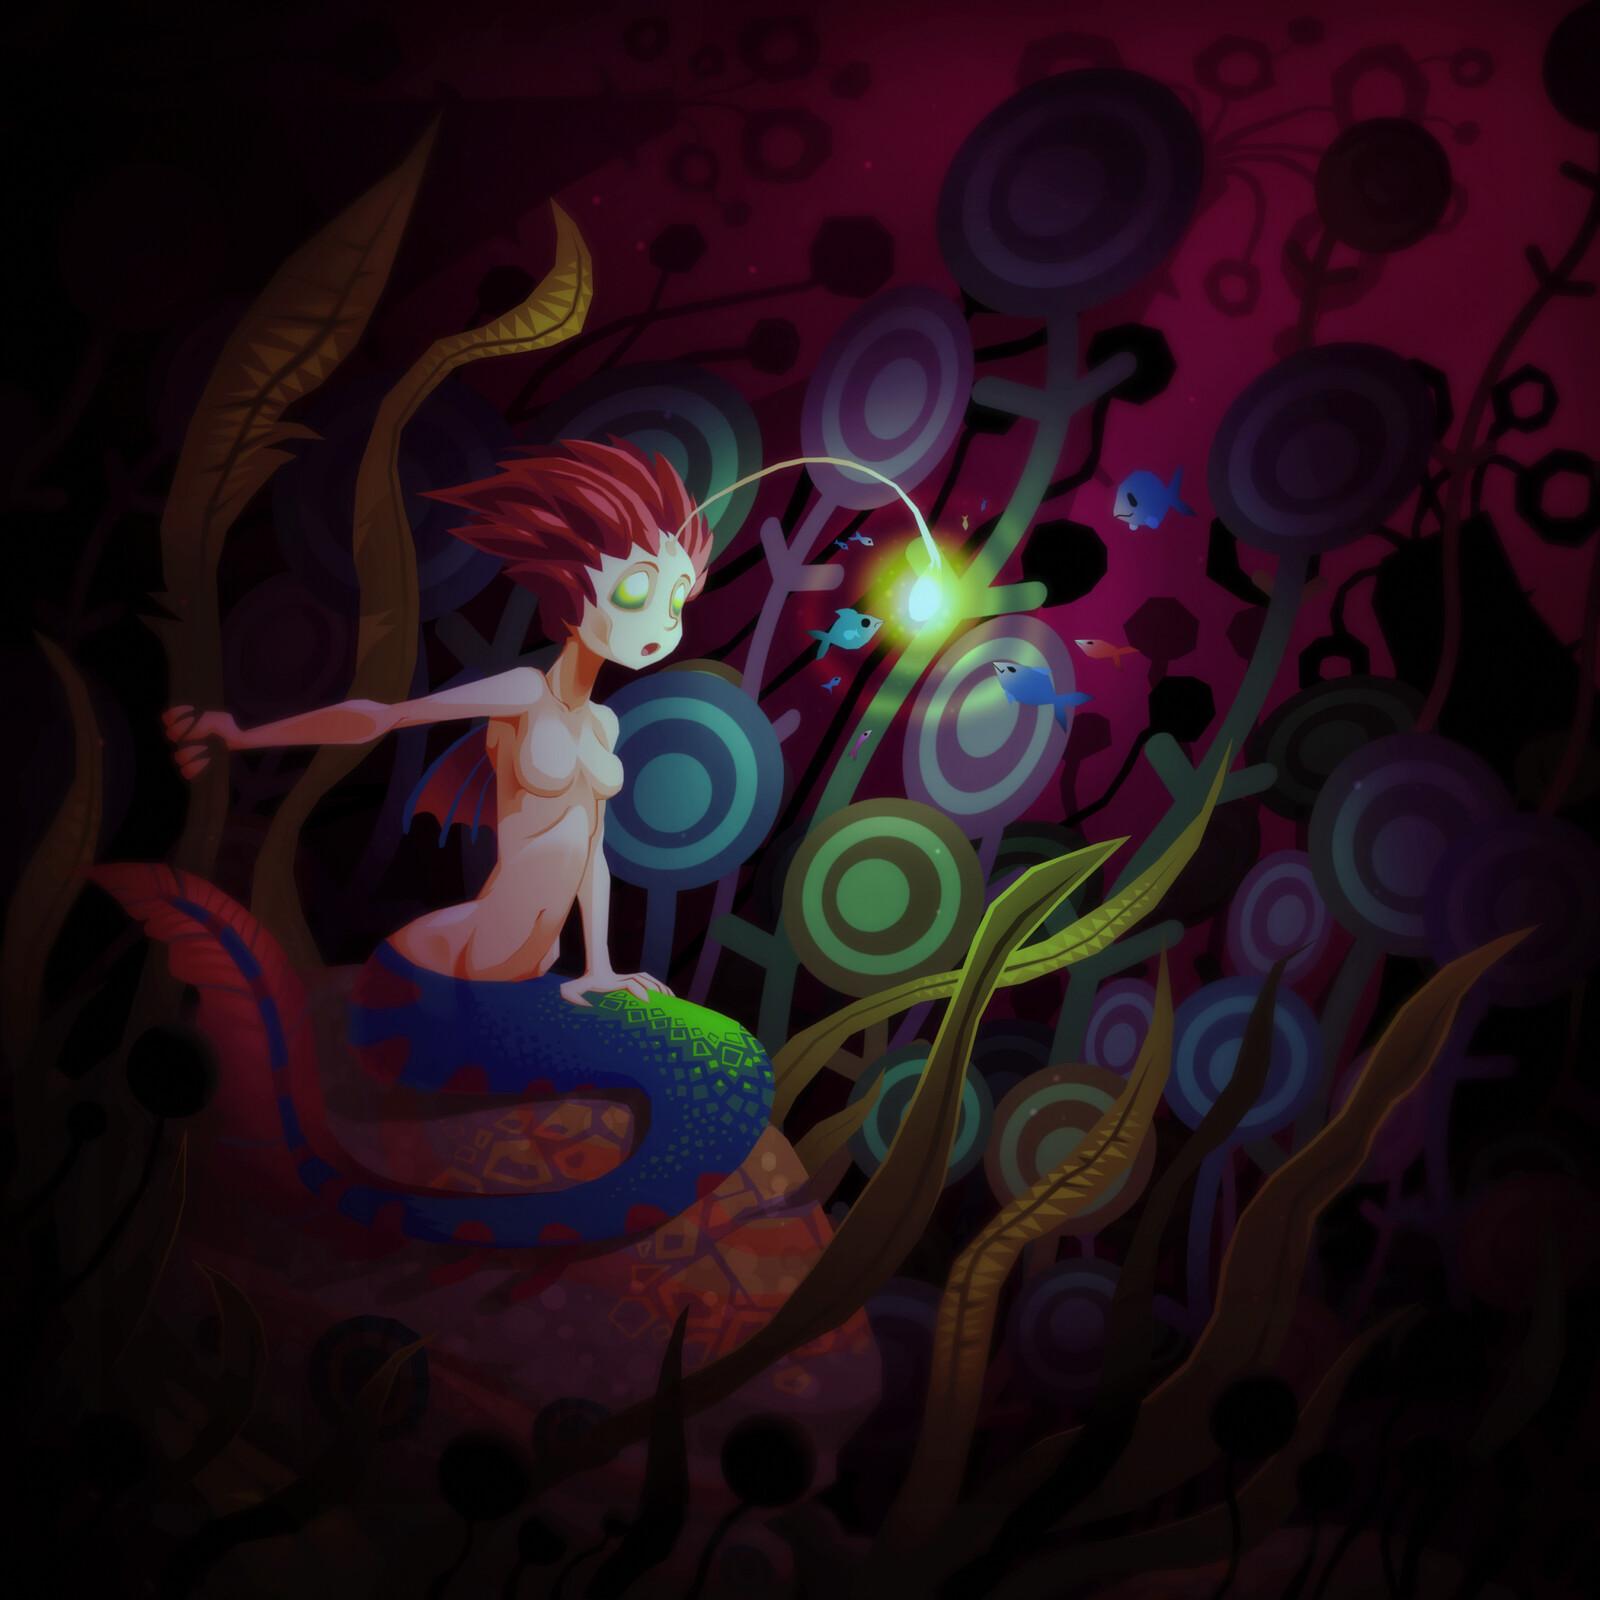 Angler mermaid